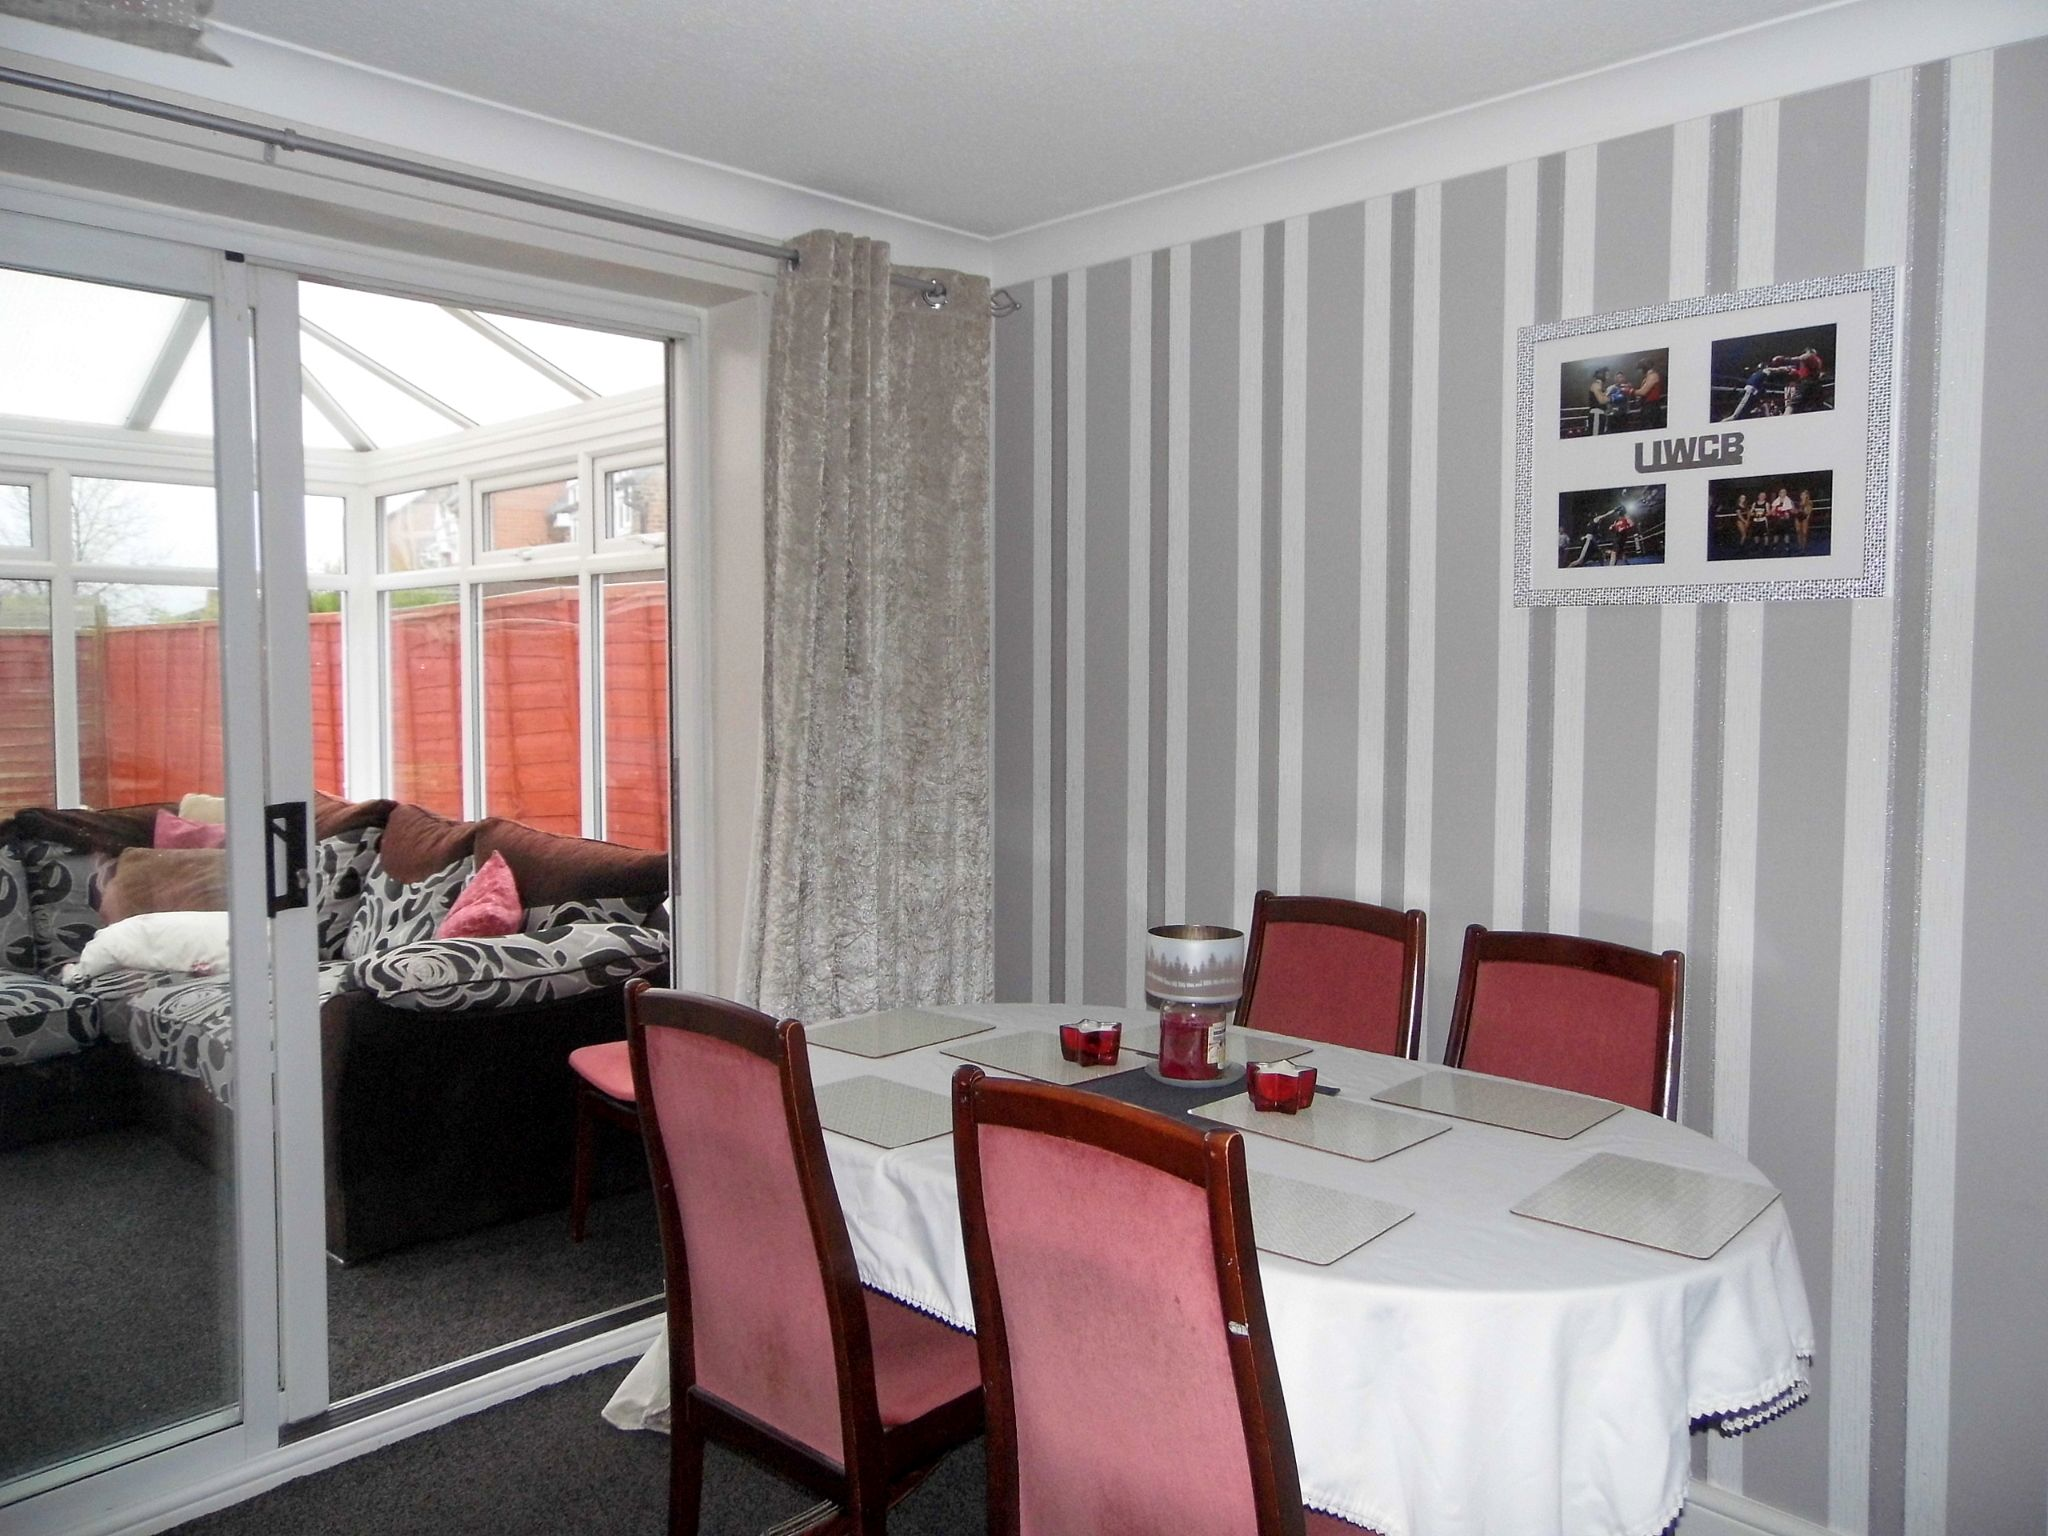 4 bedroom detached house SSTC in Bishop Auckland - Dining Room.